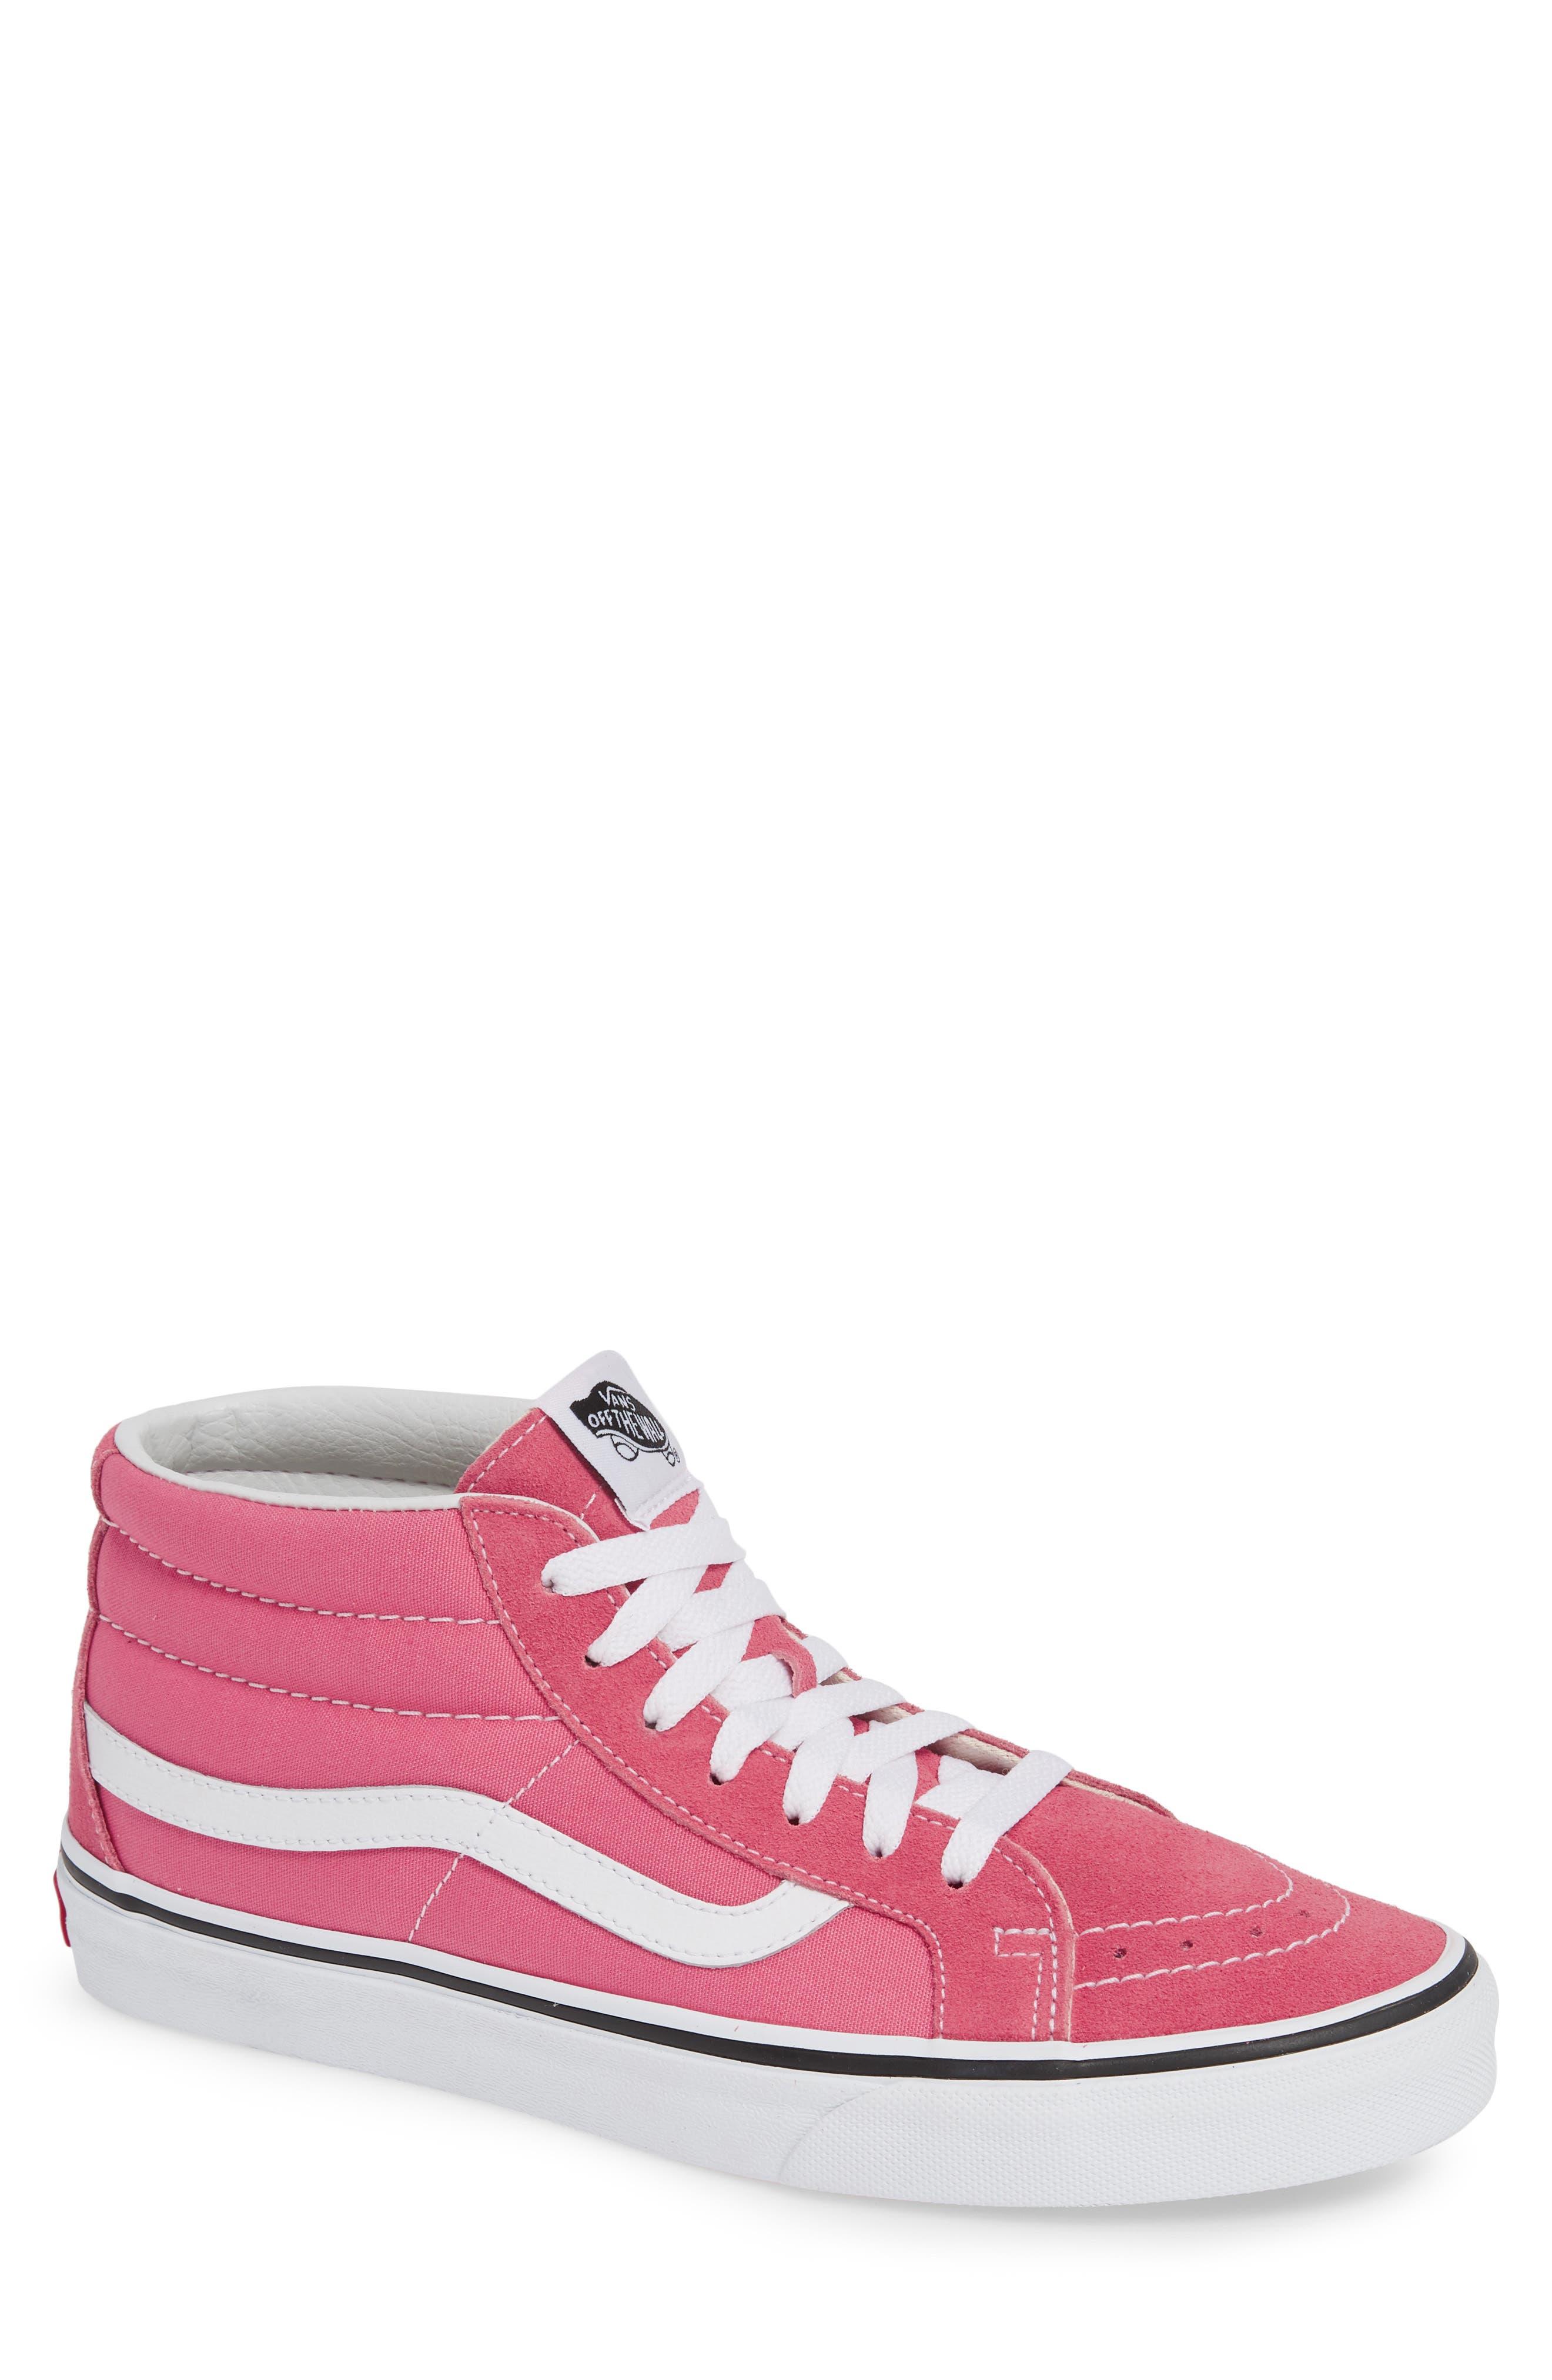 VANS Sk8-Mid Reissue Sneaker, Main, color, 660